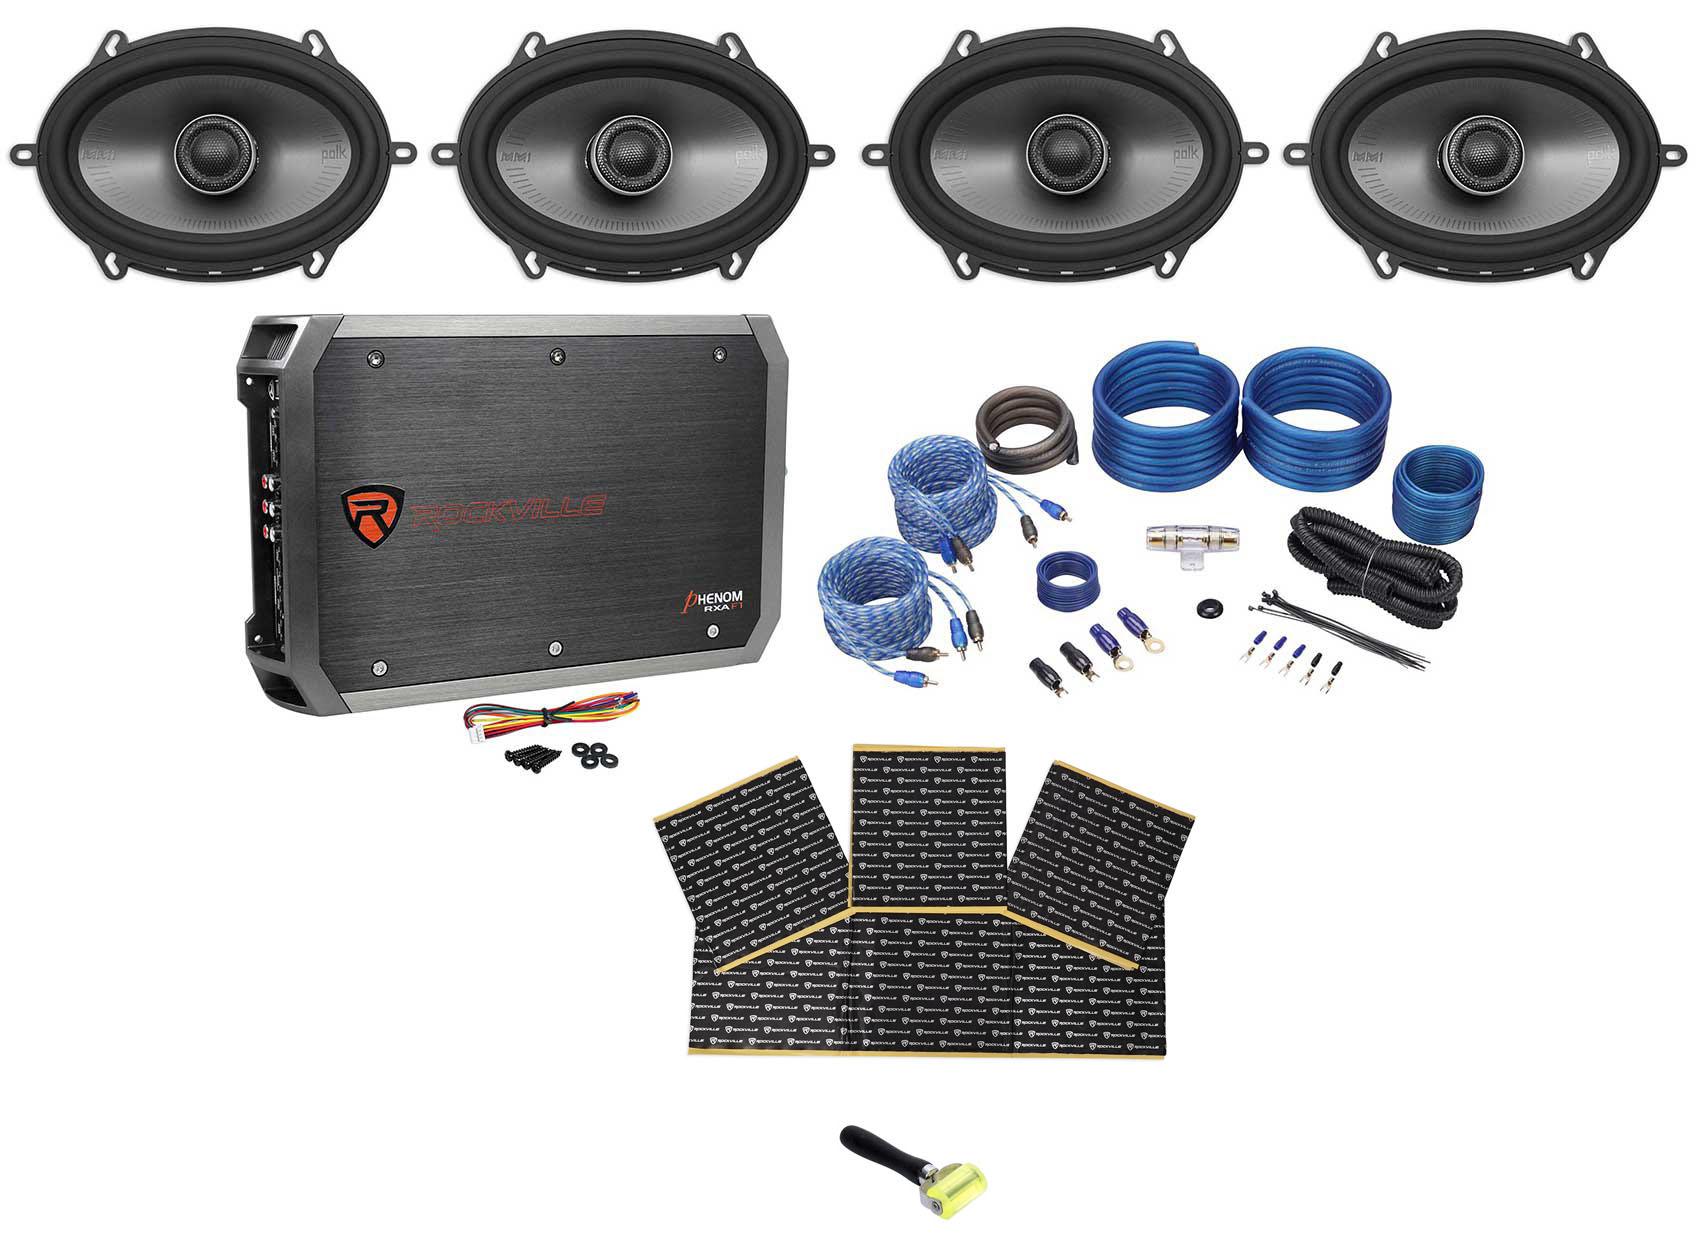 hight resolution of  4 polk audio mm572 5x7 1200 watt car speakers 4 ch amplifier wires rockmat walmart com